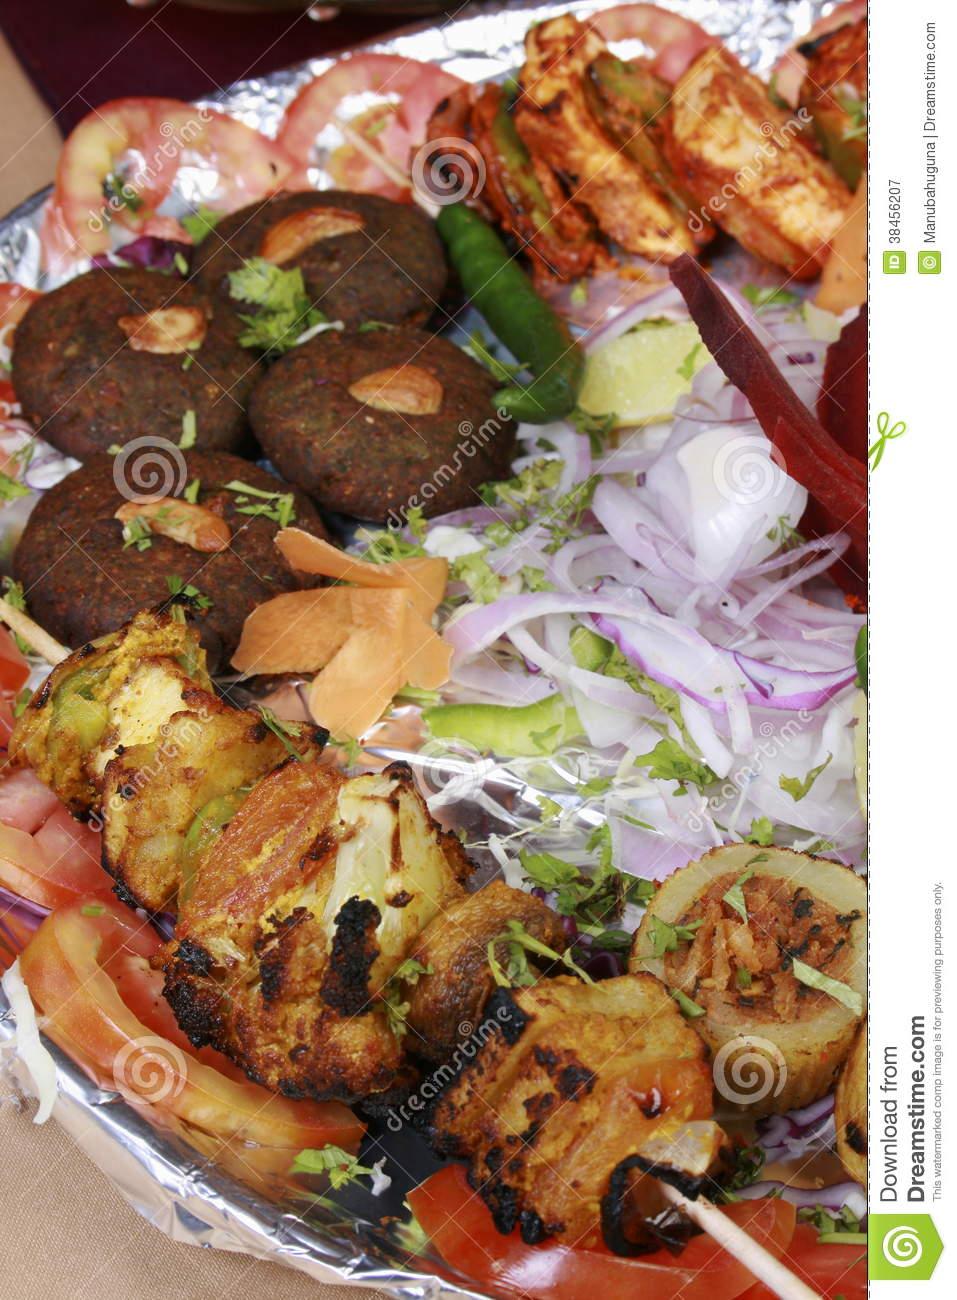 [Image: non-veg-kebab-platter-mixture-north-indi...456207.jpg]